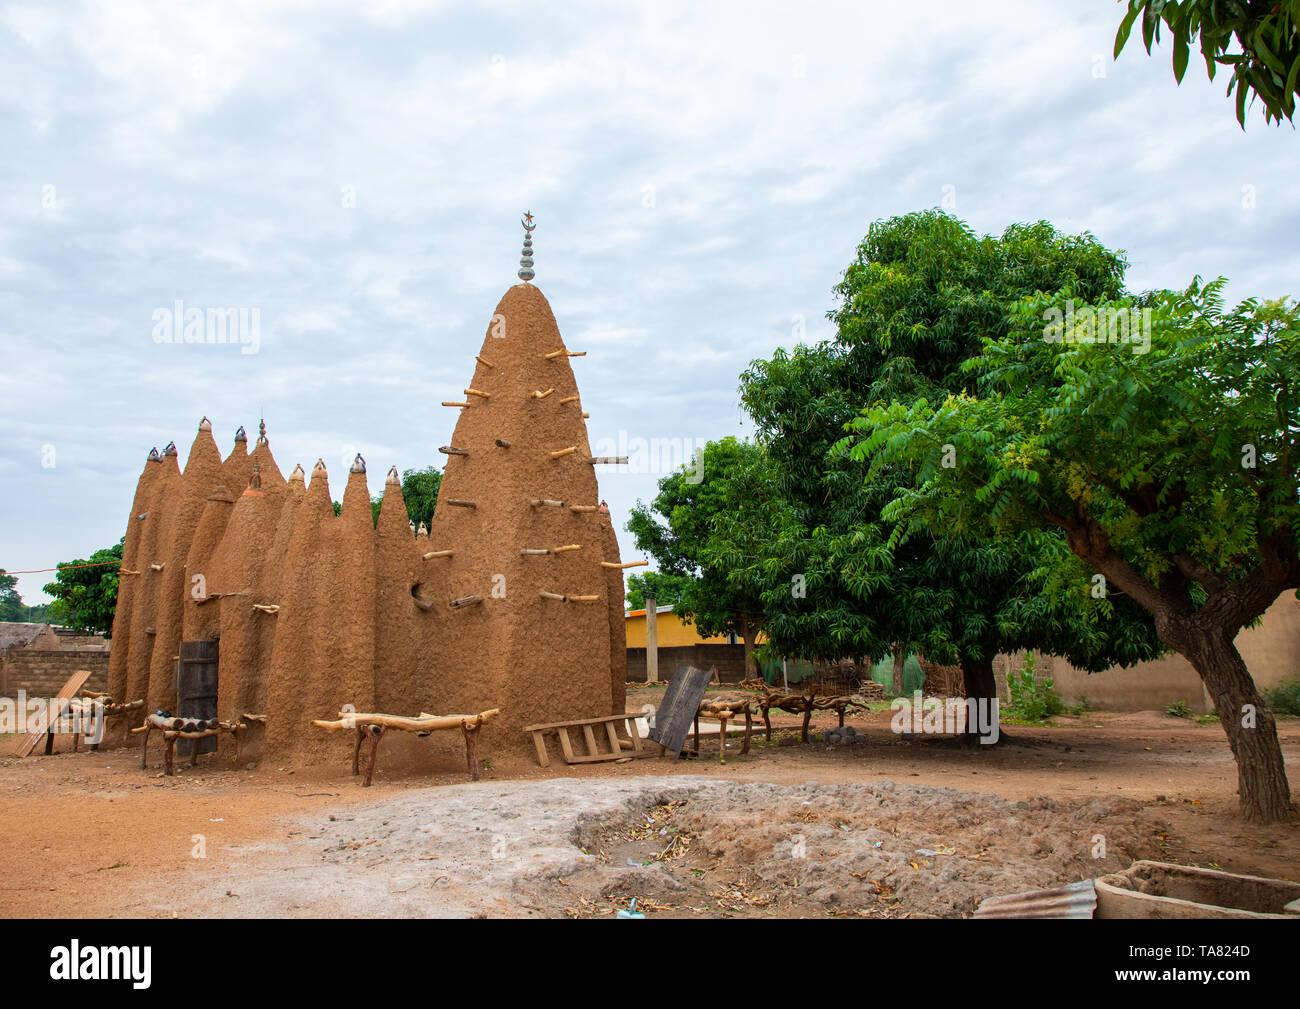 The 17th century sudano-sahelian mosque, Savanes district, Kouto, Ivory Coast - Stock Image